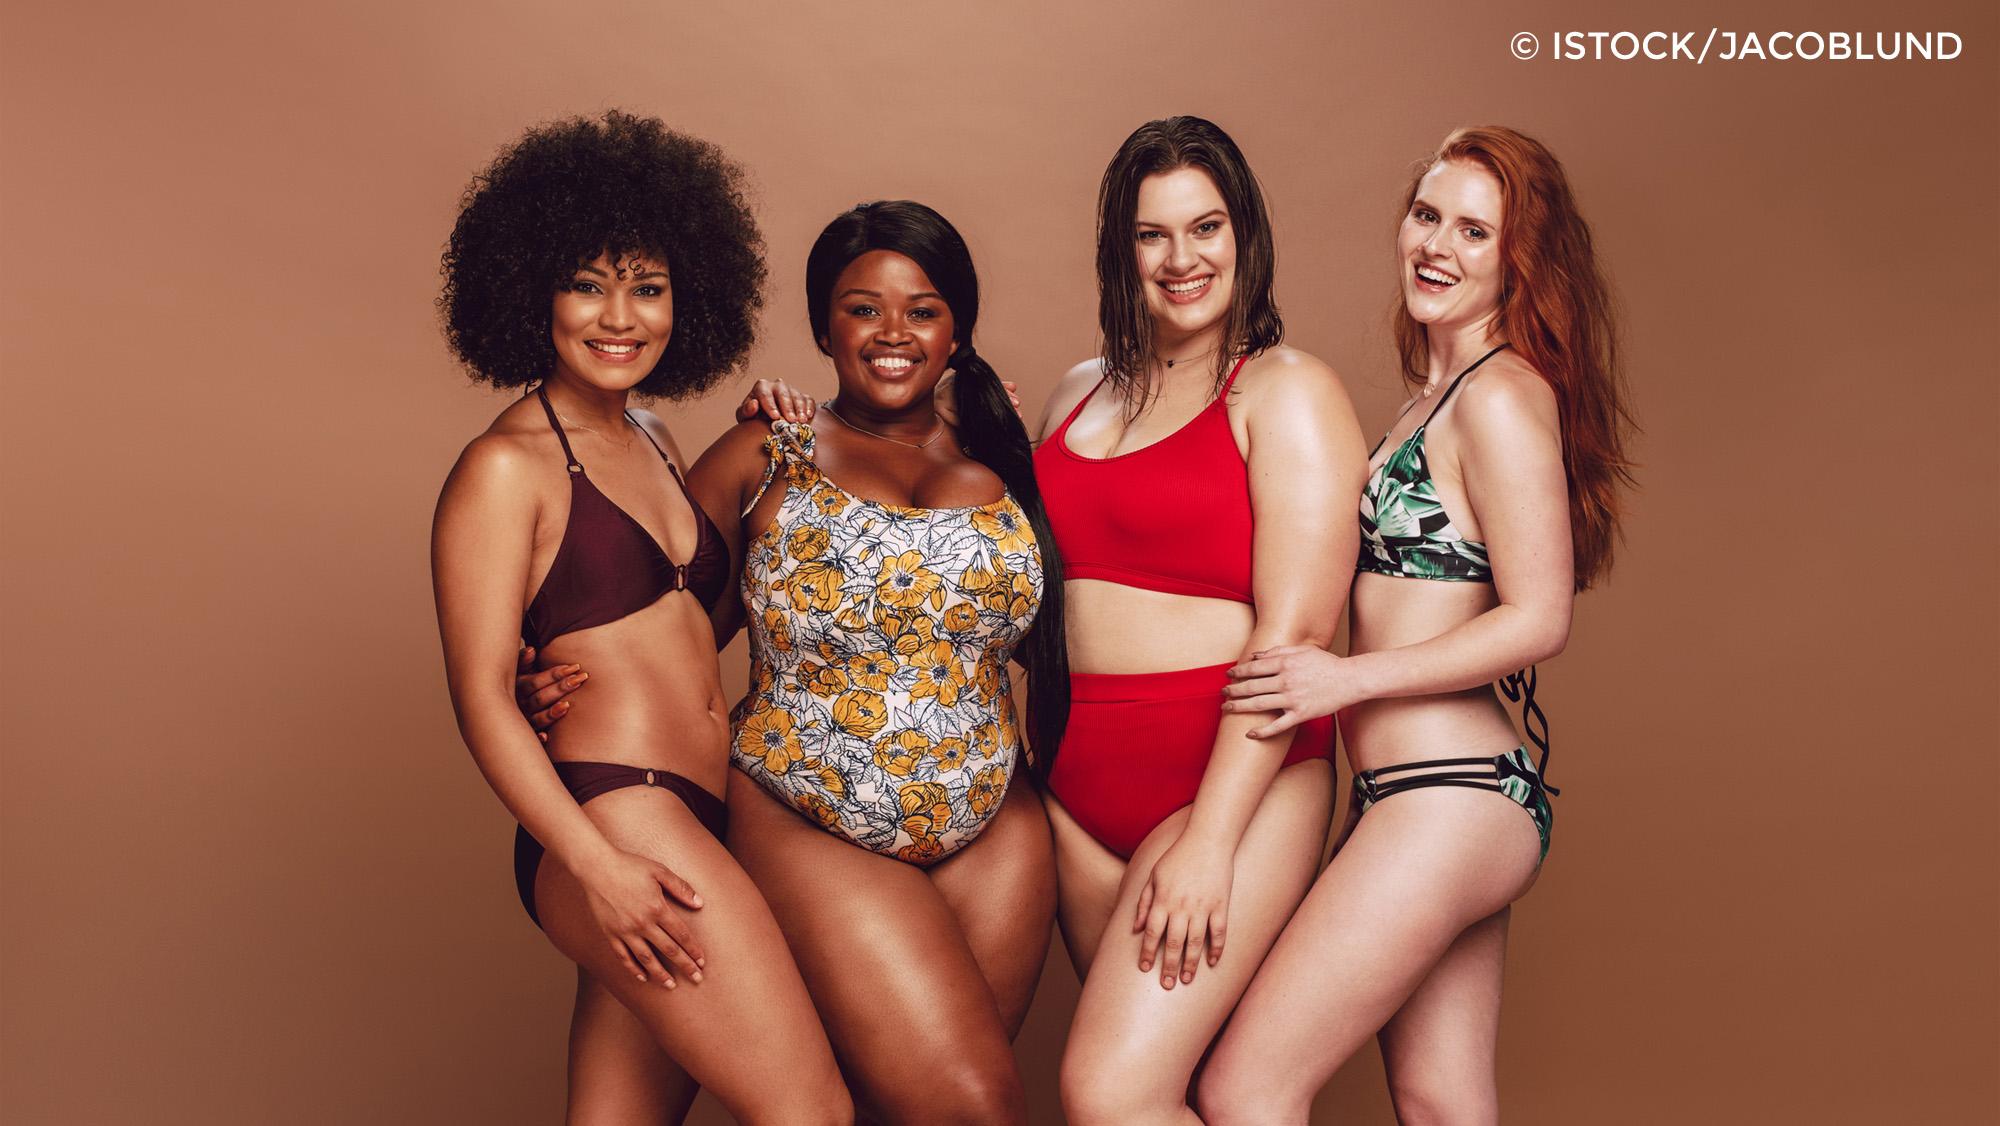 Strandoutfit-Beratung: Welcher Bikini passt zu welcher Figur?